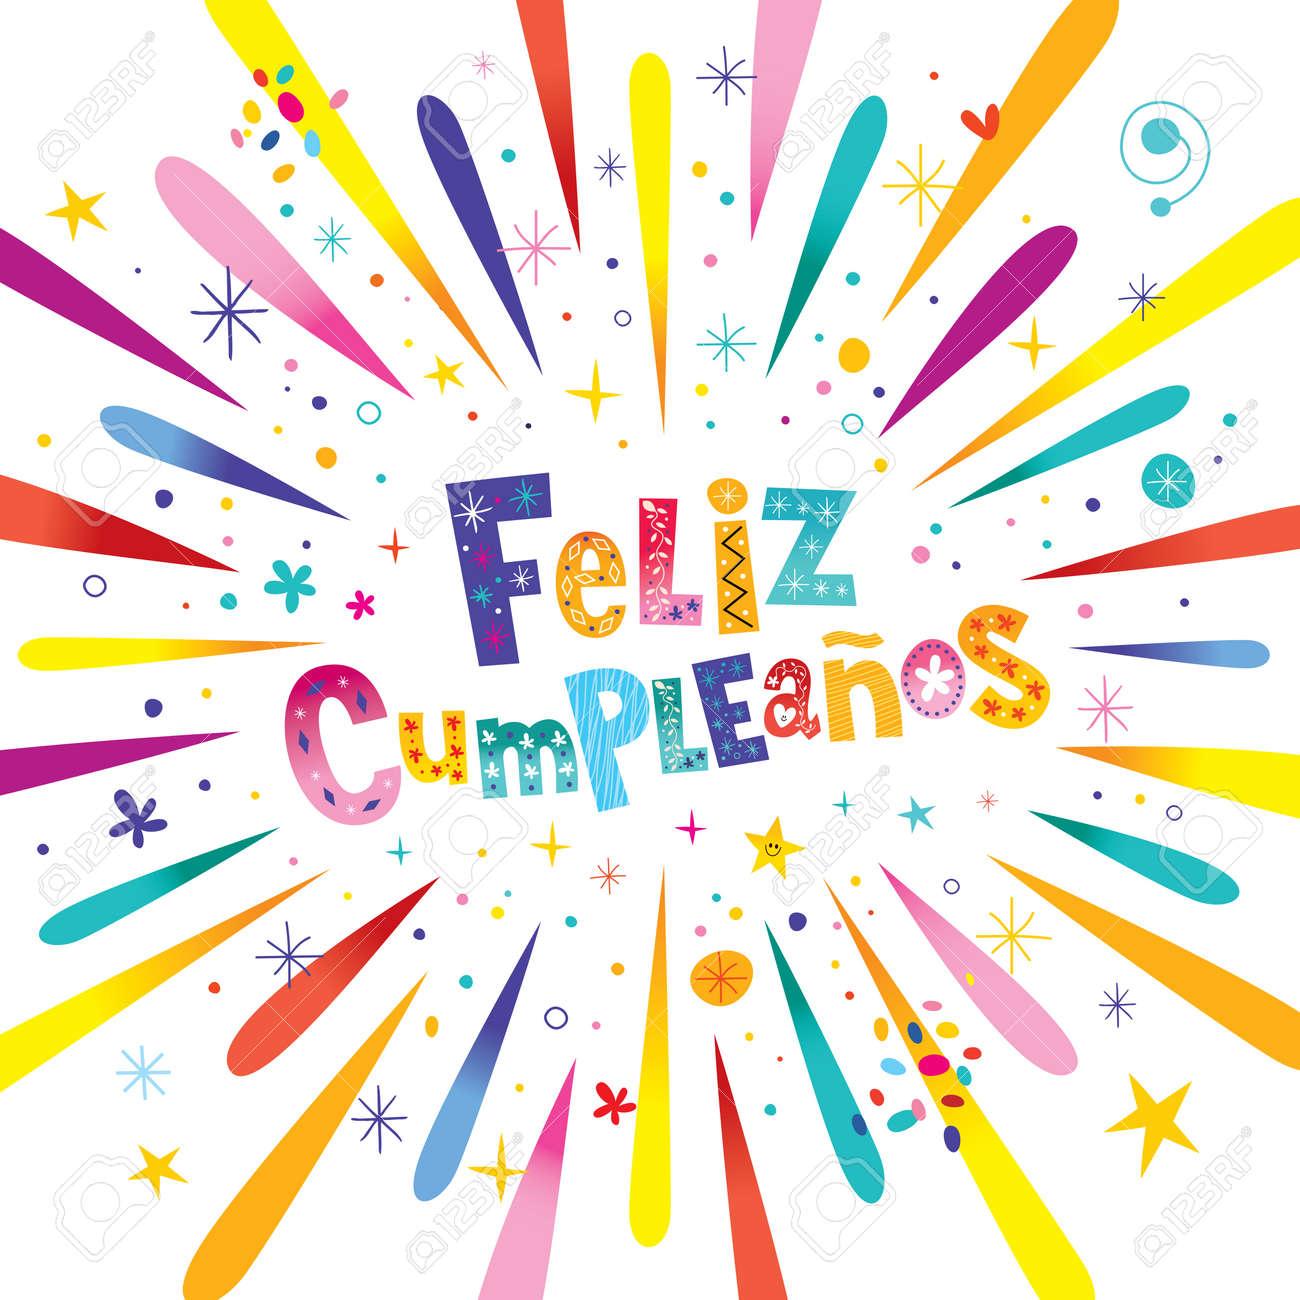 Feliz Cumpleanos Happy Birthday In Spanish Greeting Card With – Spanish Birthday Cards Free